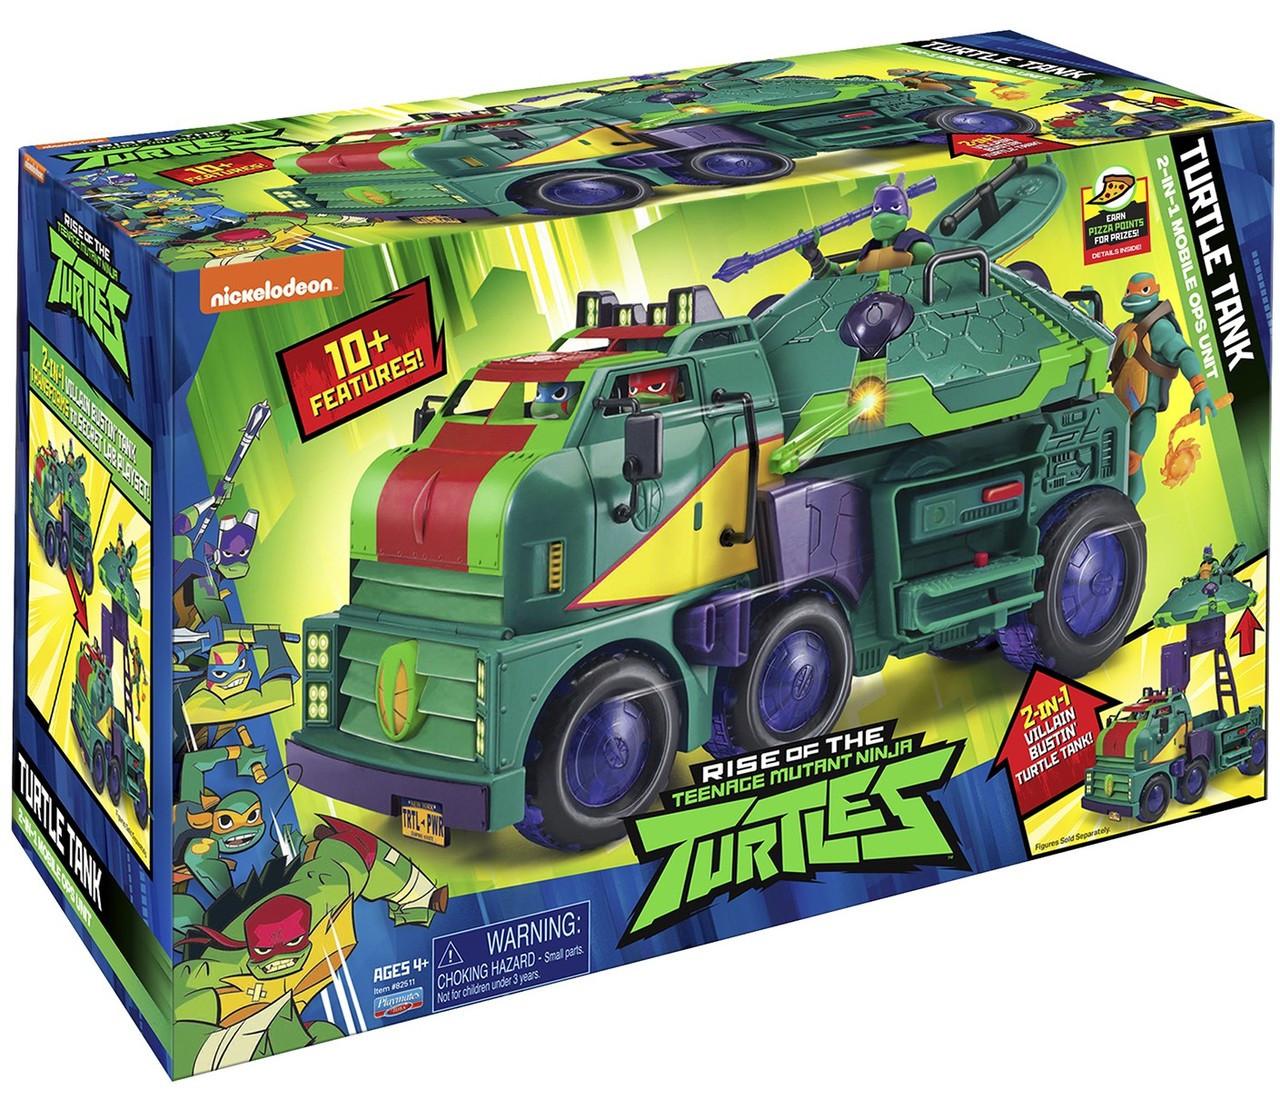 Teenage Mutant Ninja Turtles Nickelodeon Rise of the TMNT ...Nickelodeon Ninja Turtles Toys